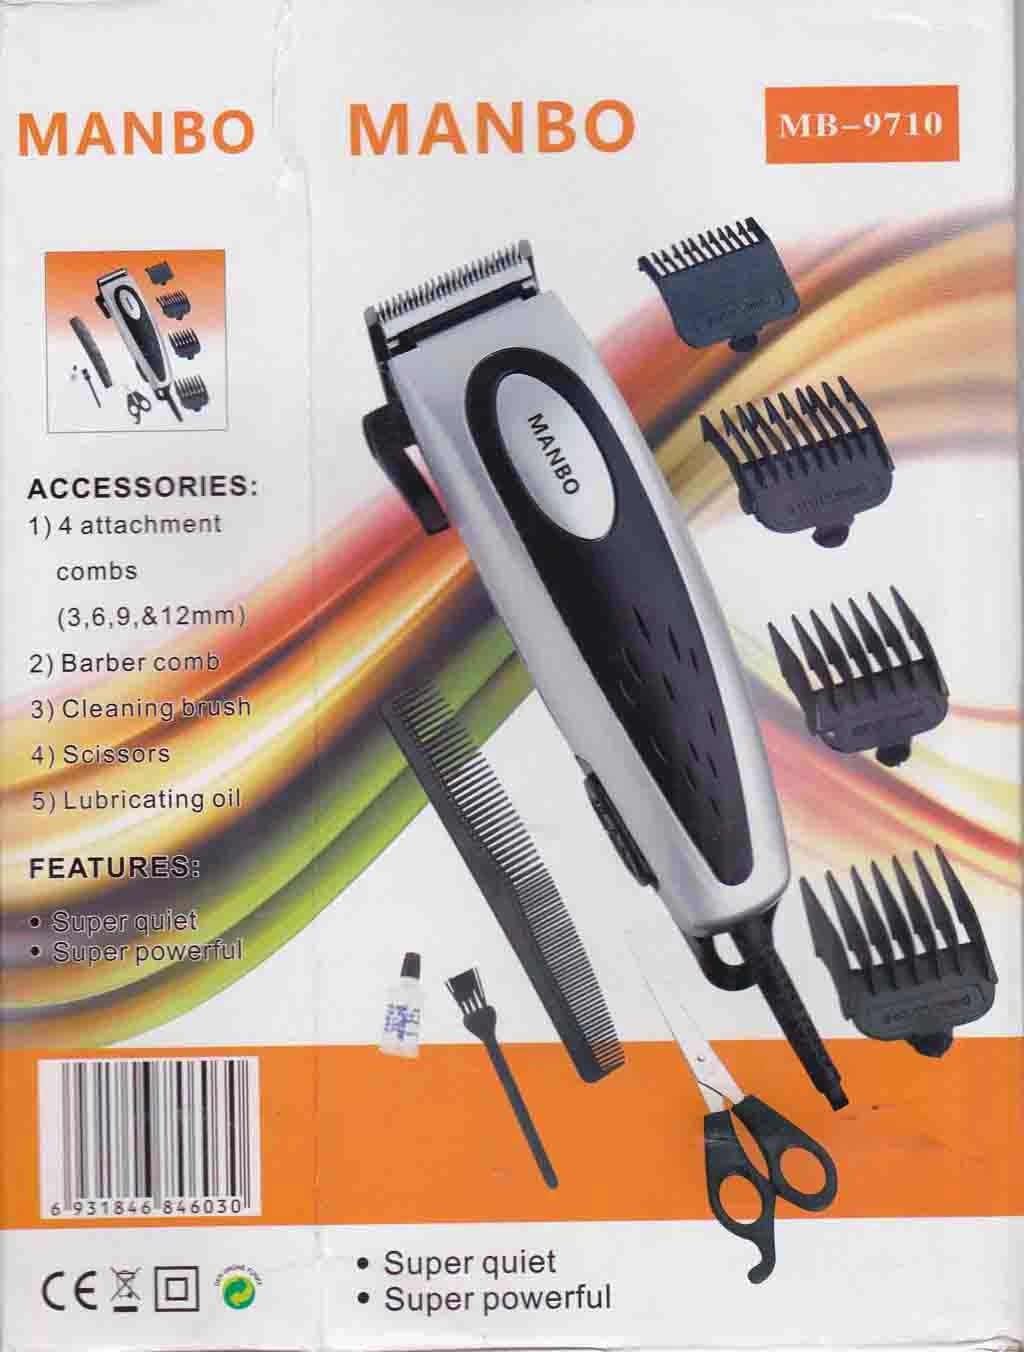 jual barang online banjarmasin  alat cukur rambut MANBO professional ... 255fbbc365